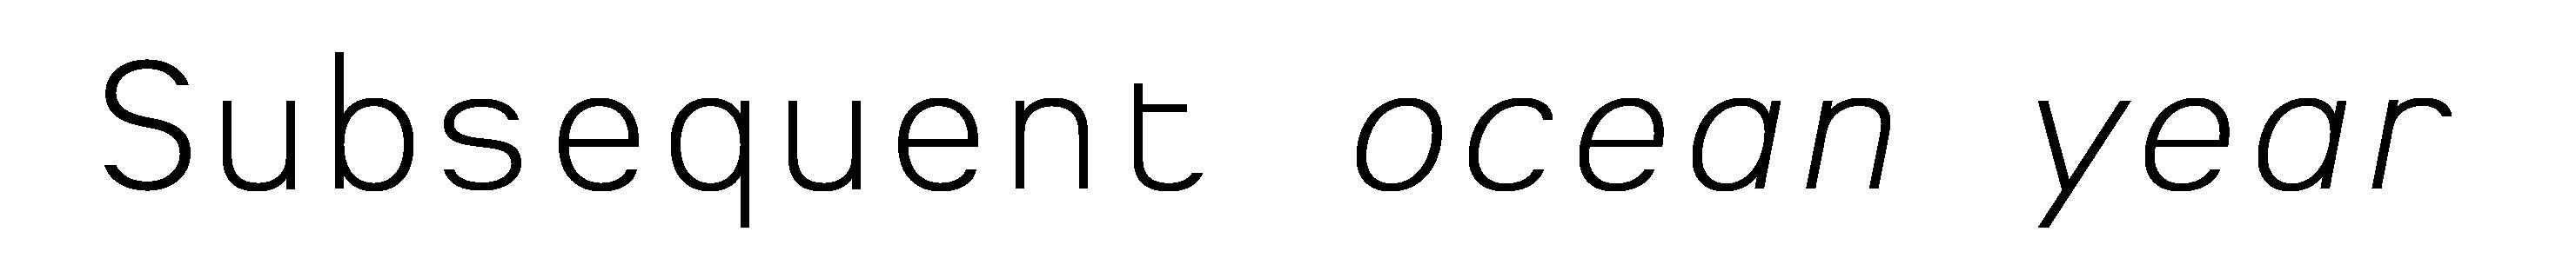 Typeface Heimat Mono D08 Atlas Font Foundry